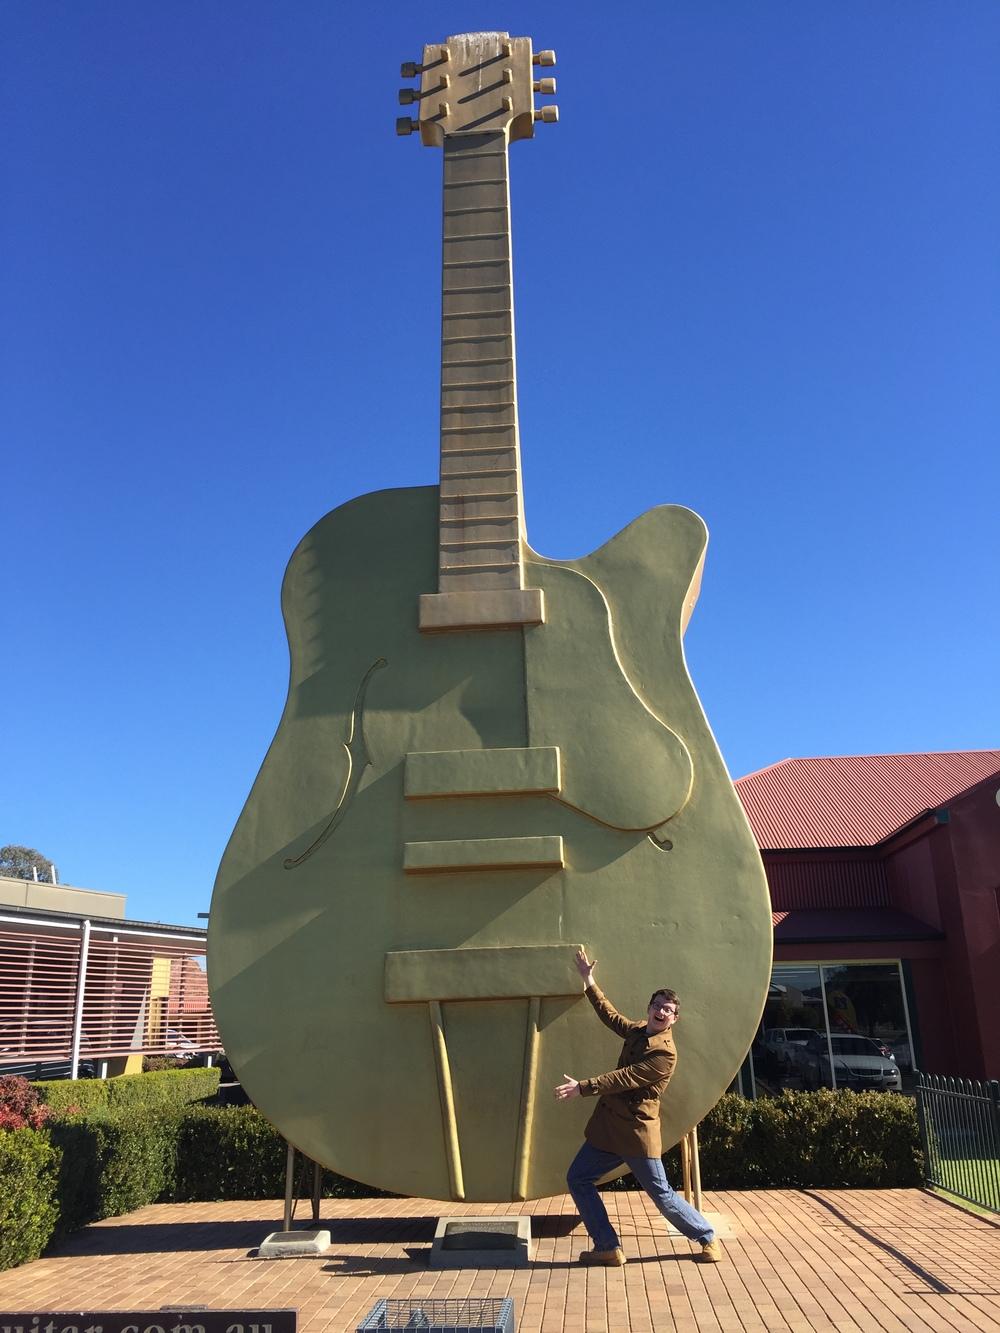 The Big Golden Guitar, Tamworth NSW. Photo: Peter Scott,© 2016.